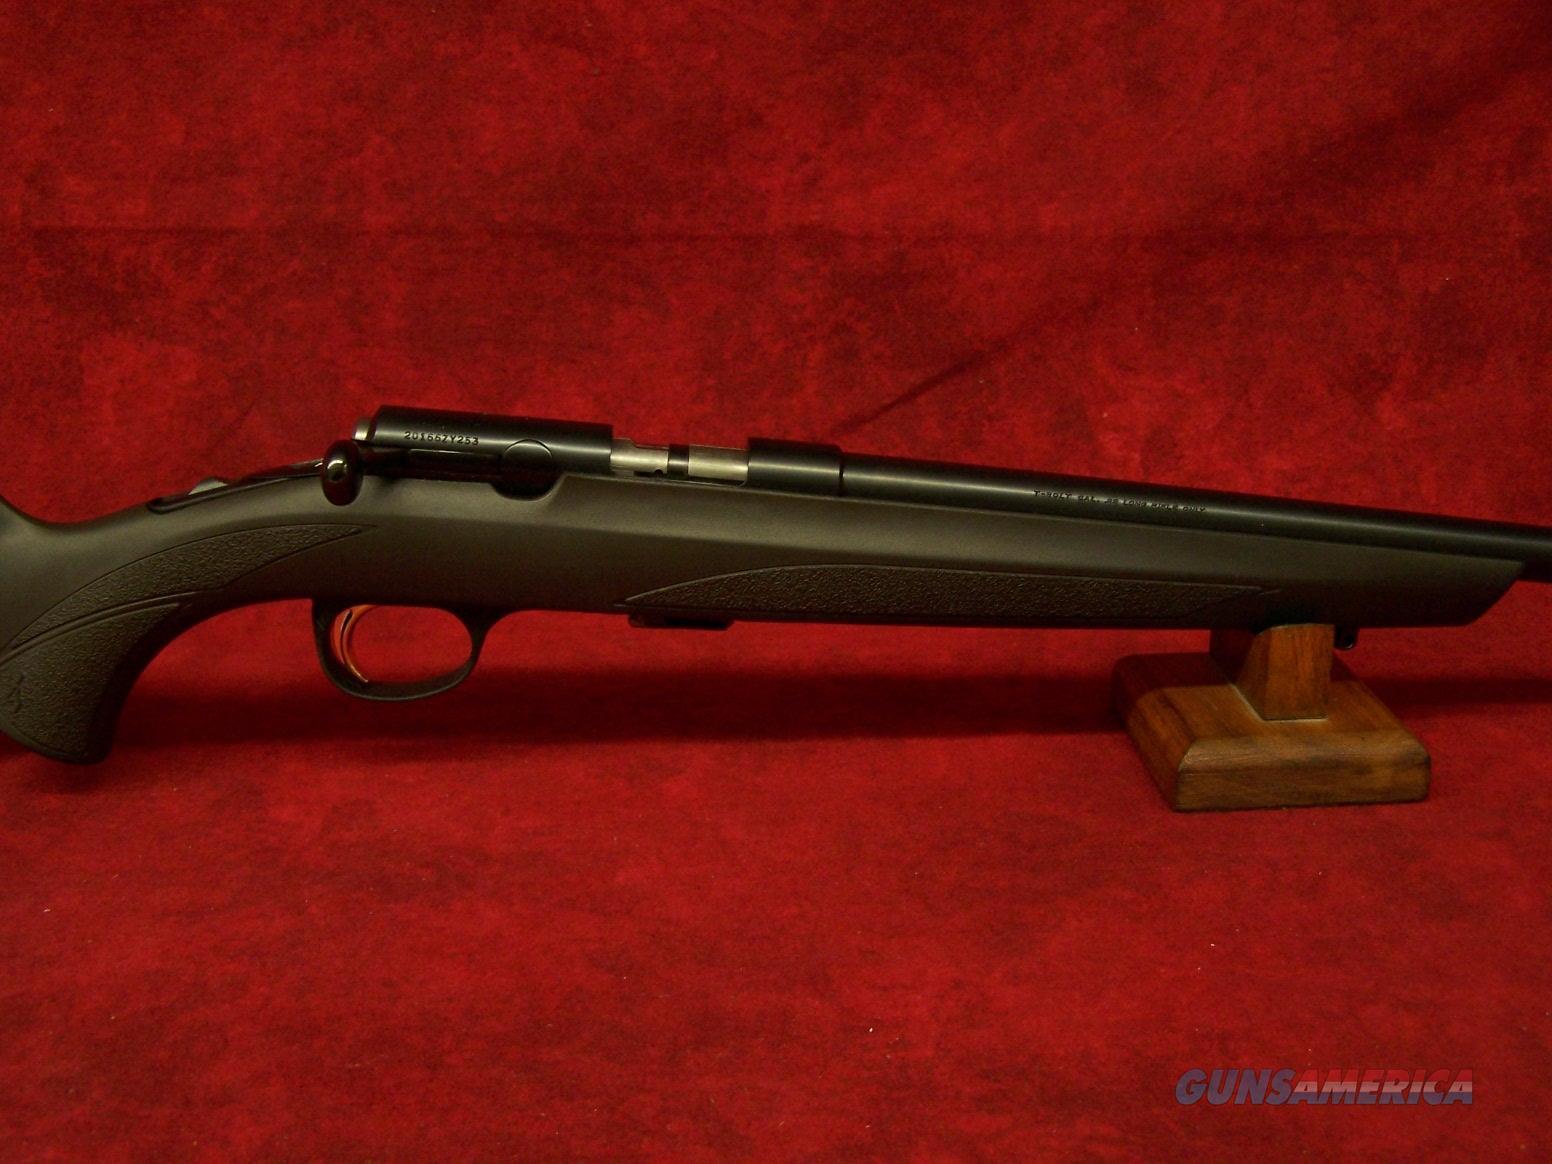 "BROWNING T-BOLT SPORTER COMP 22LR NS 22"" (025179202)  Guns > Rifles > Browning Rifles > Bolt Action > Hunting > Blue"